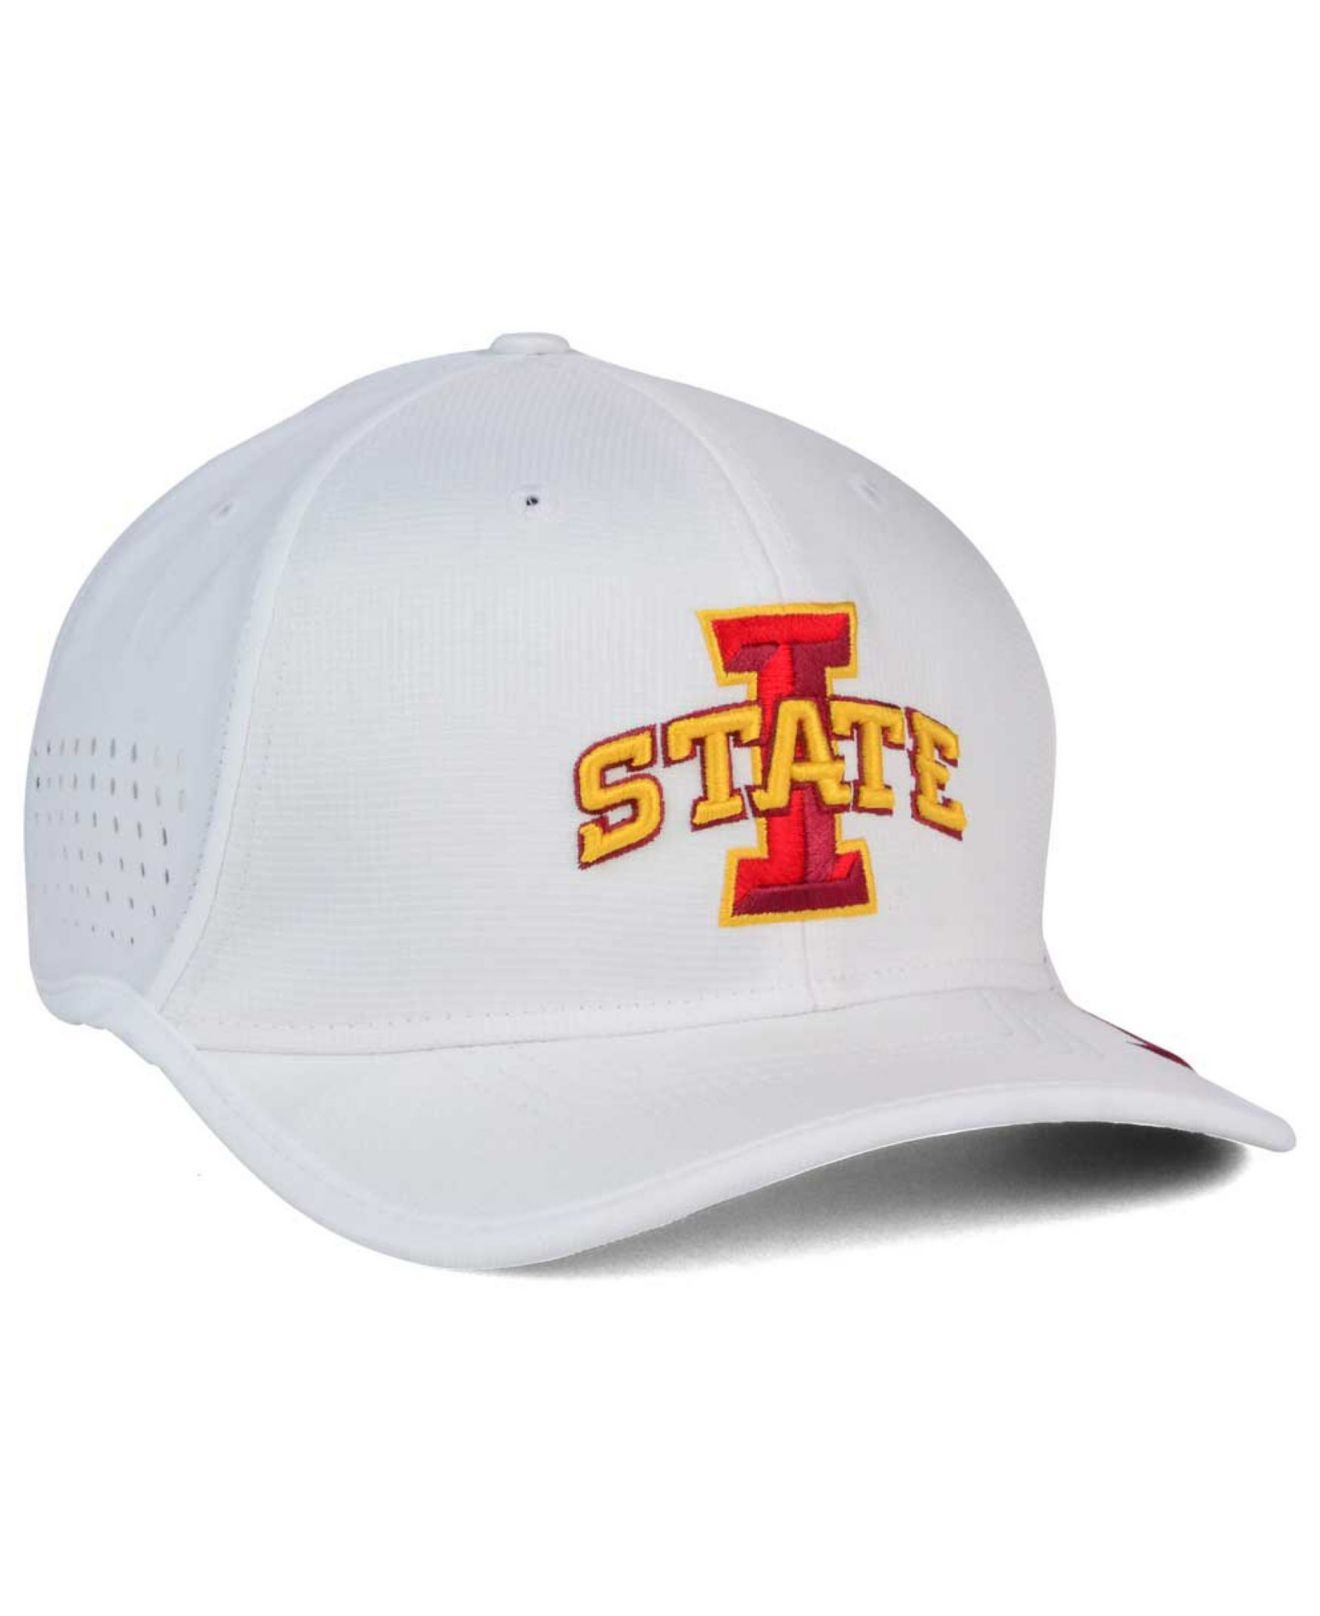 7baa189d0cb Lyst - Nike Iowa State Cyclones Vapor Sideline Coaches Cap in White ...